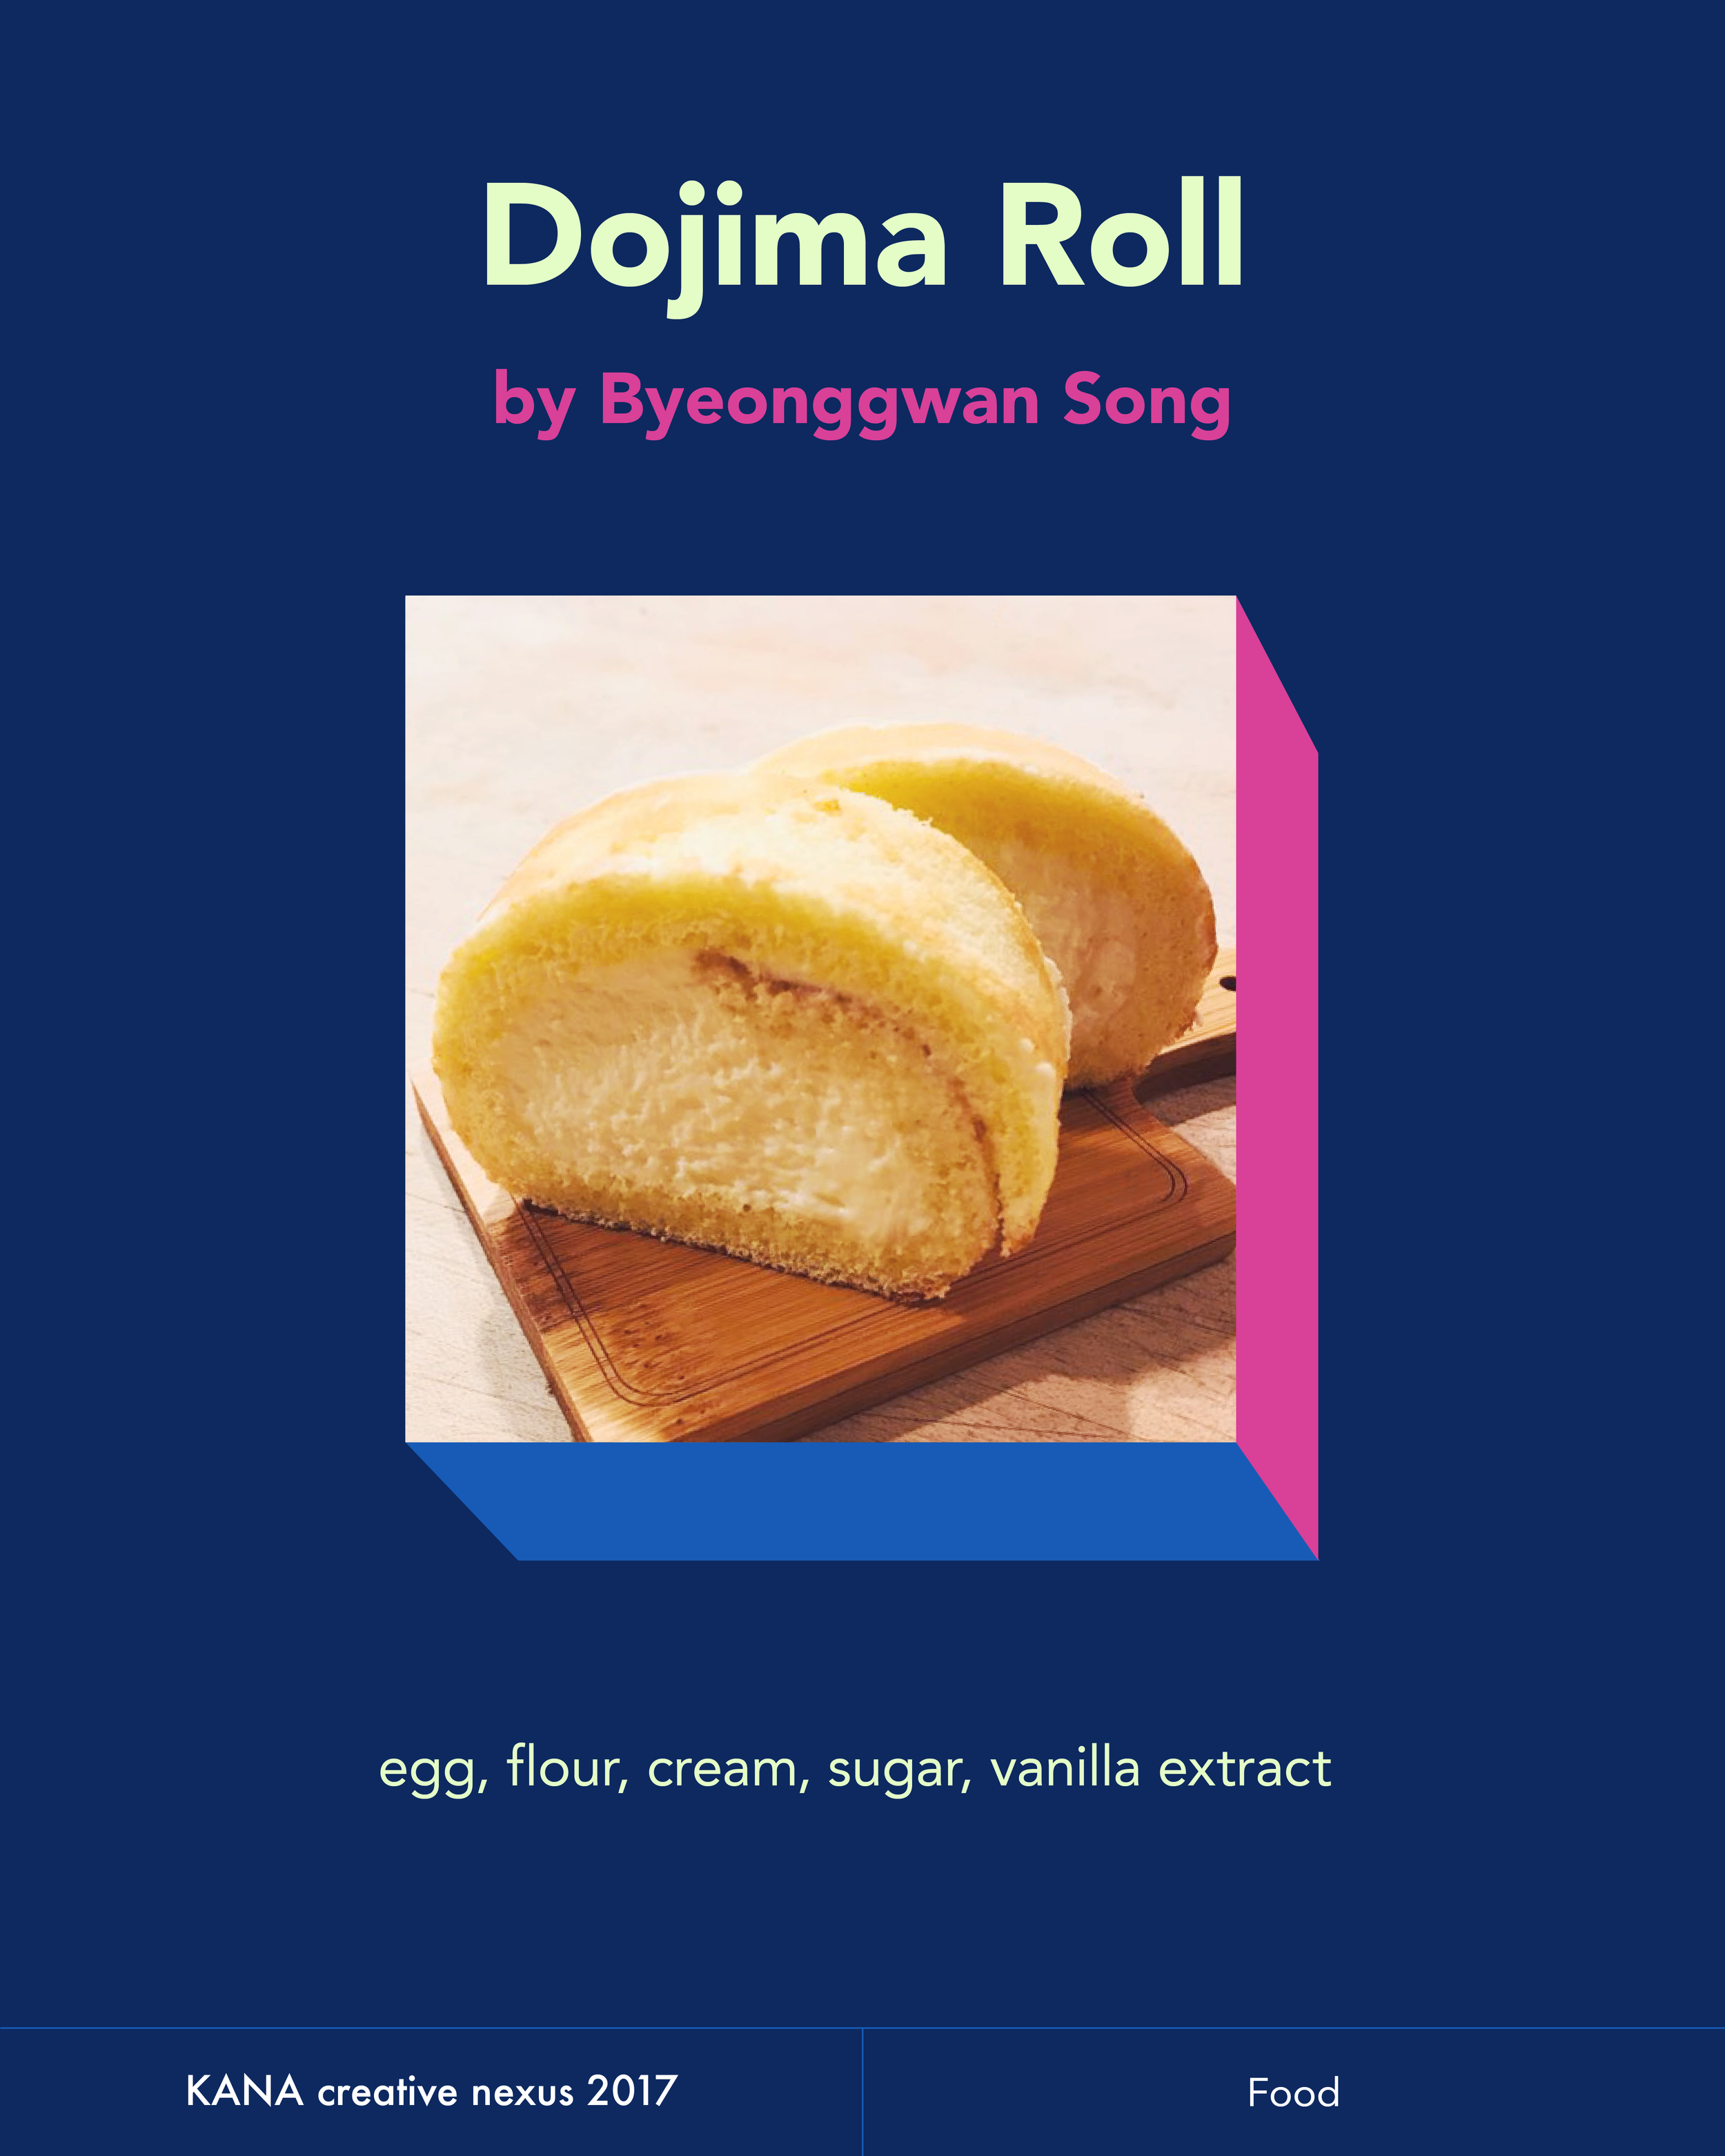 KANA_Social_Food_Dojima Roll.png